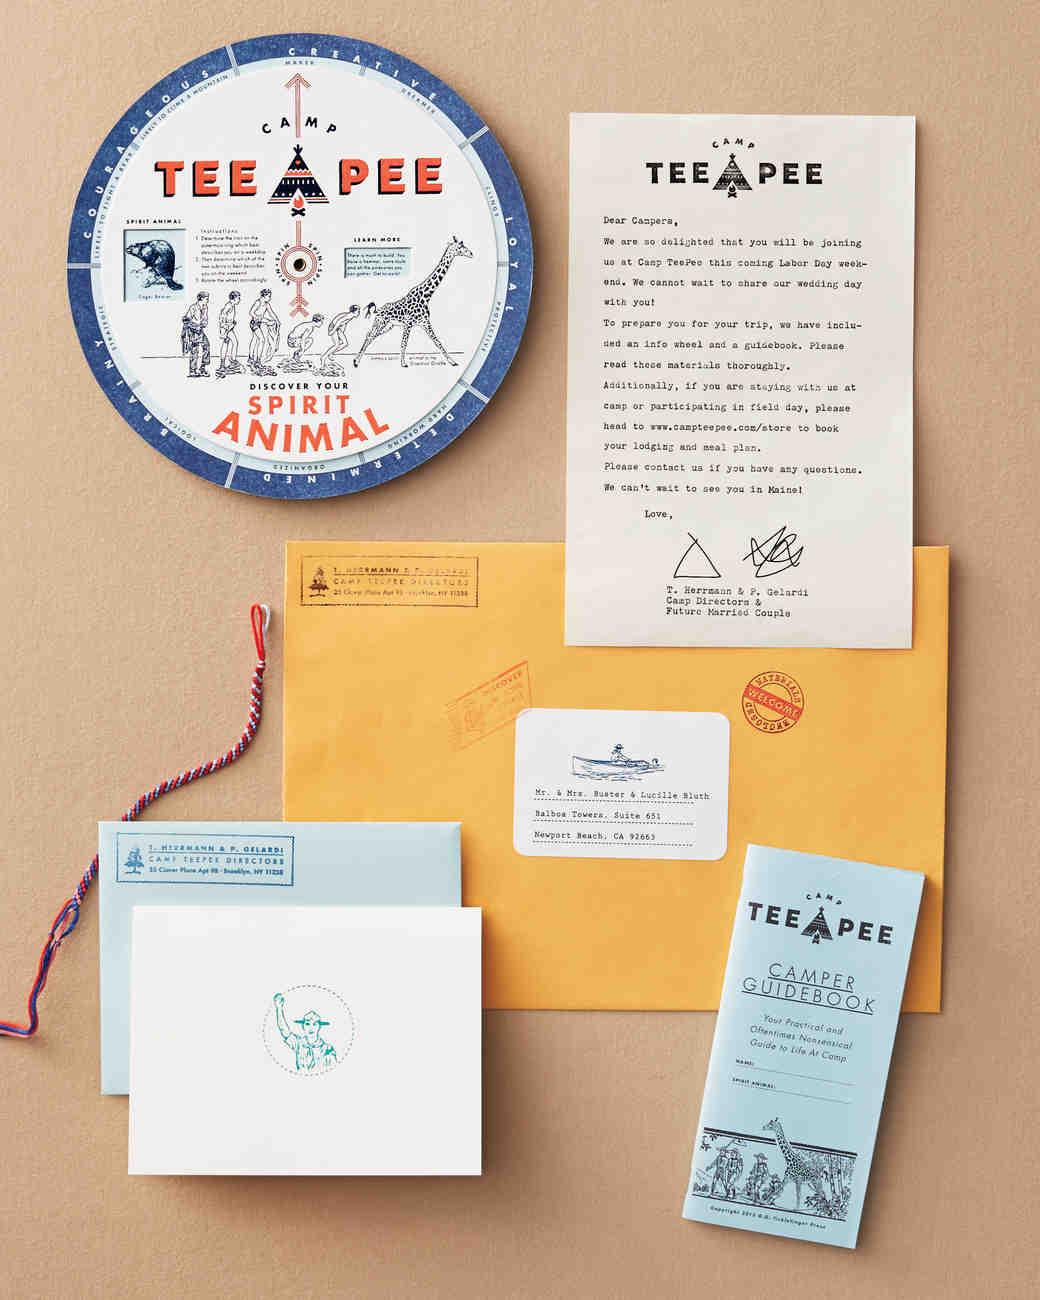 teresa-pepin-tee-pee-stationery-080-d111017.jpg